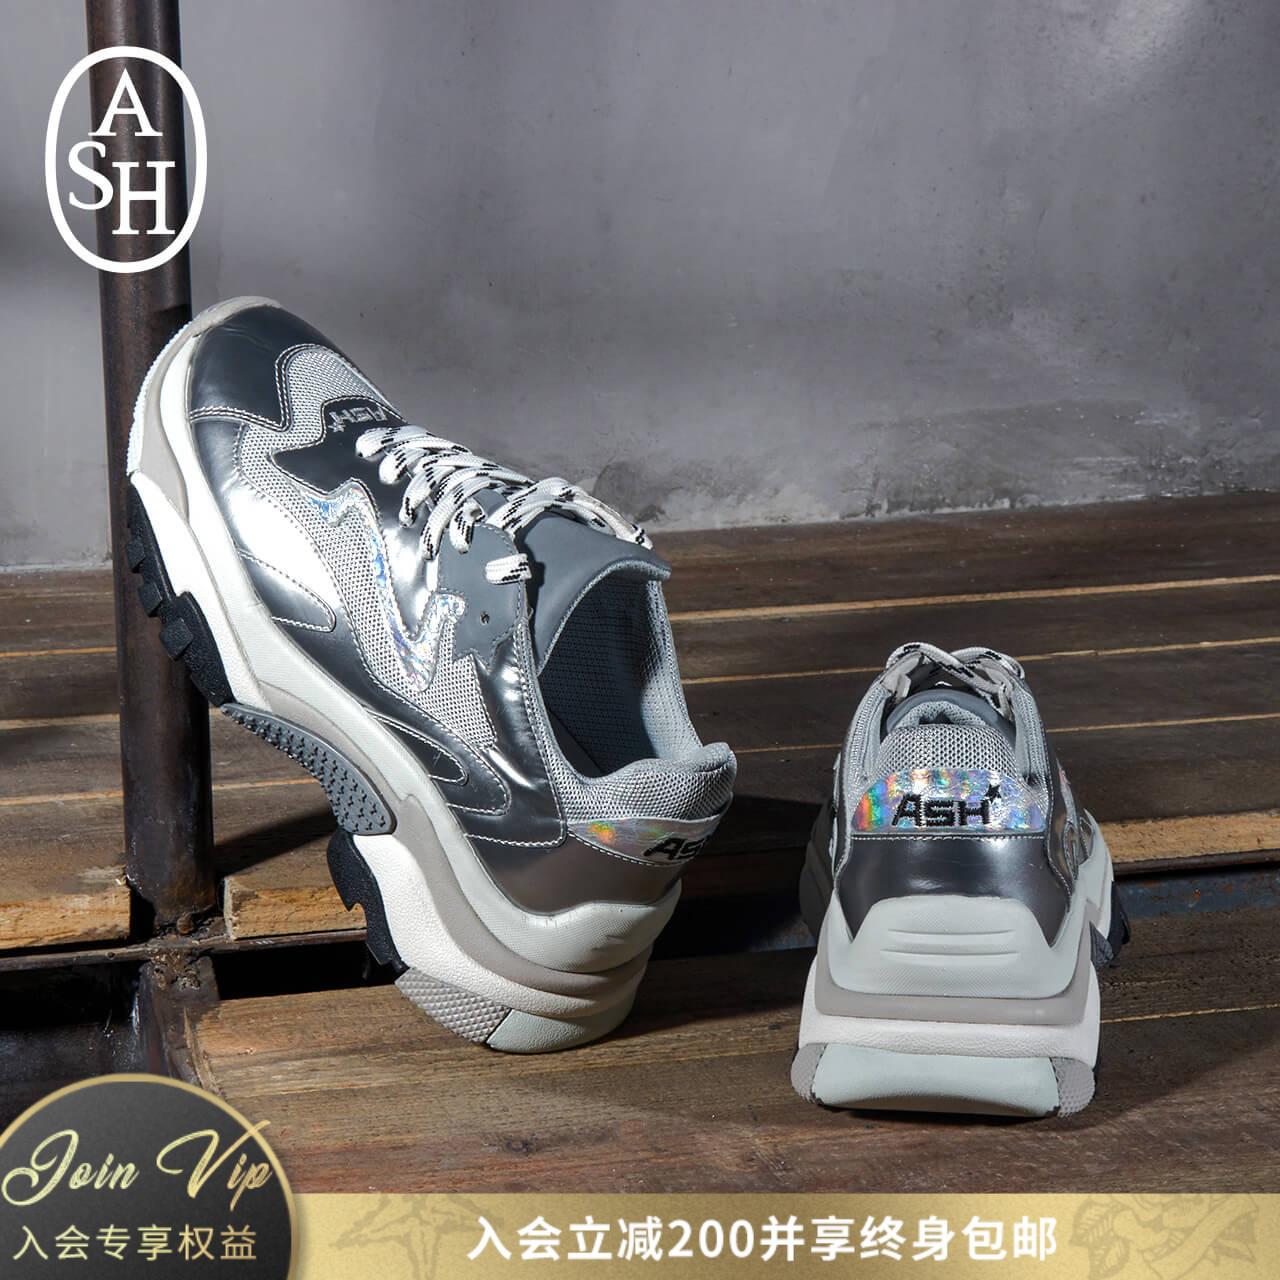 ASH女鞋2018新款ADDICT时尚牛皮拼色低帮运动鞋增高老爹鞋